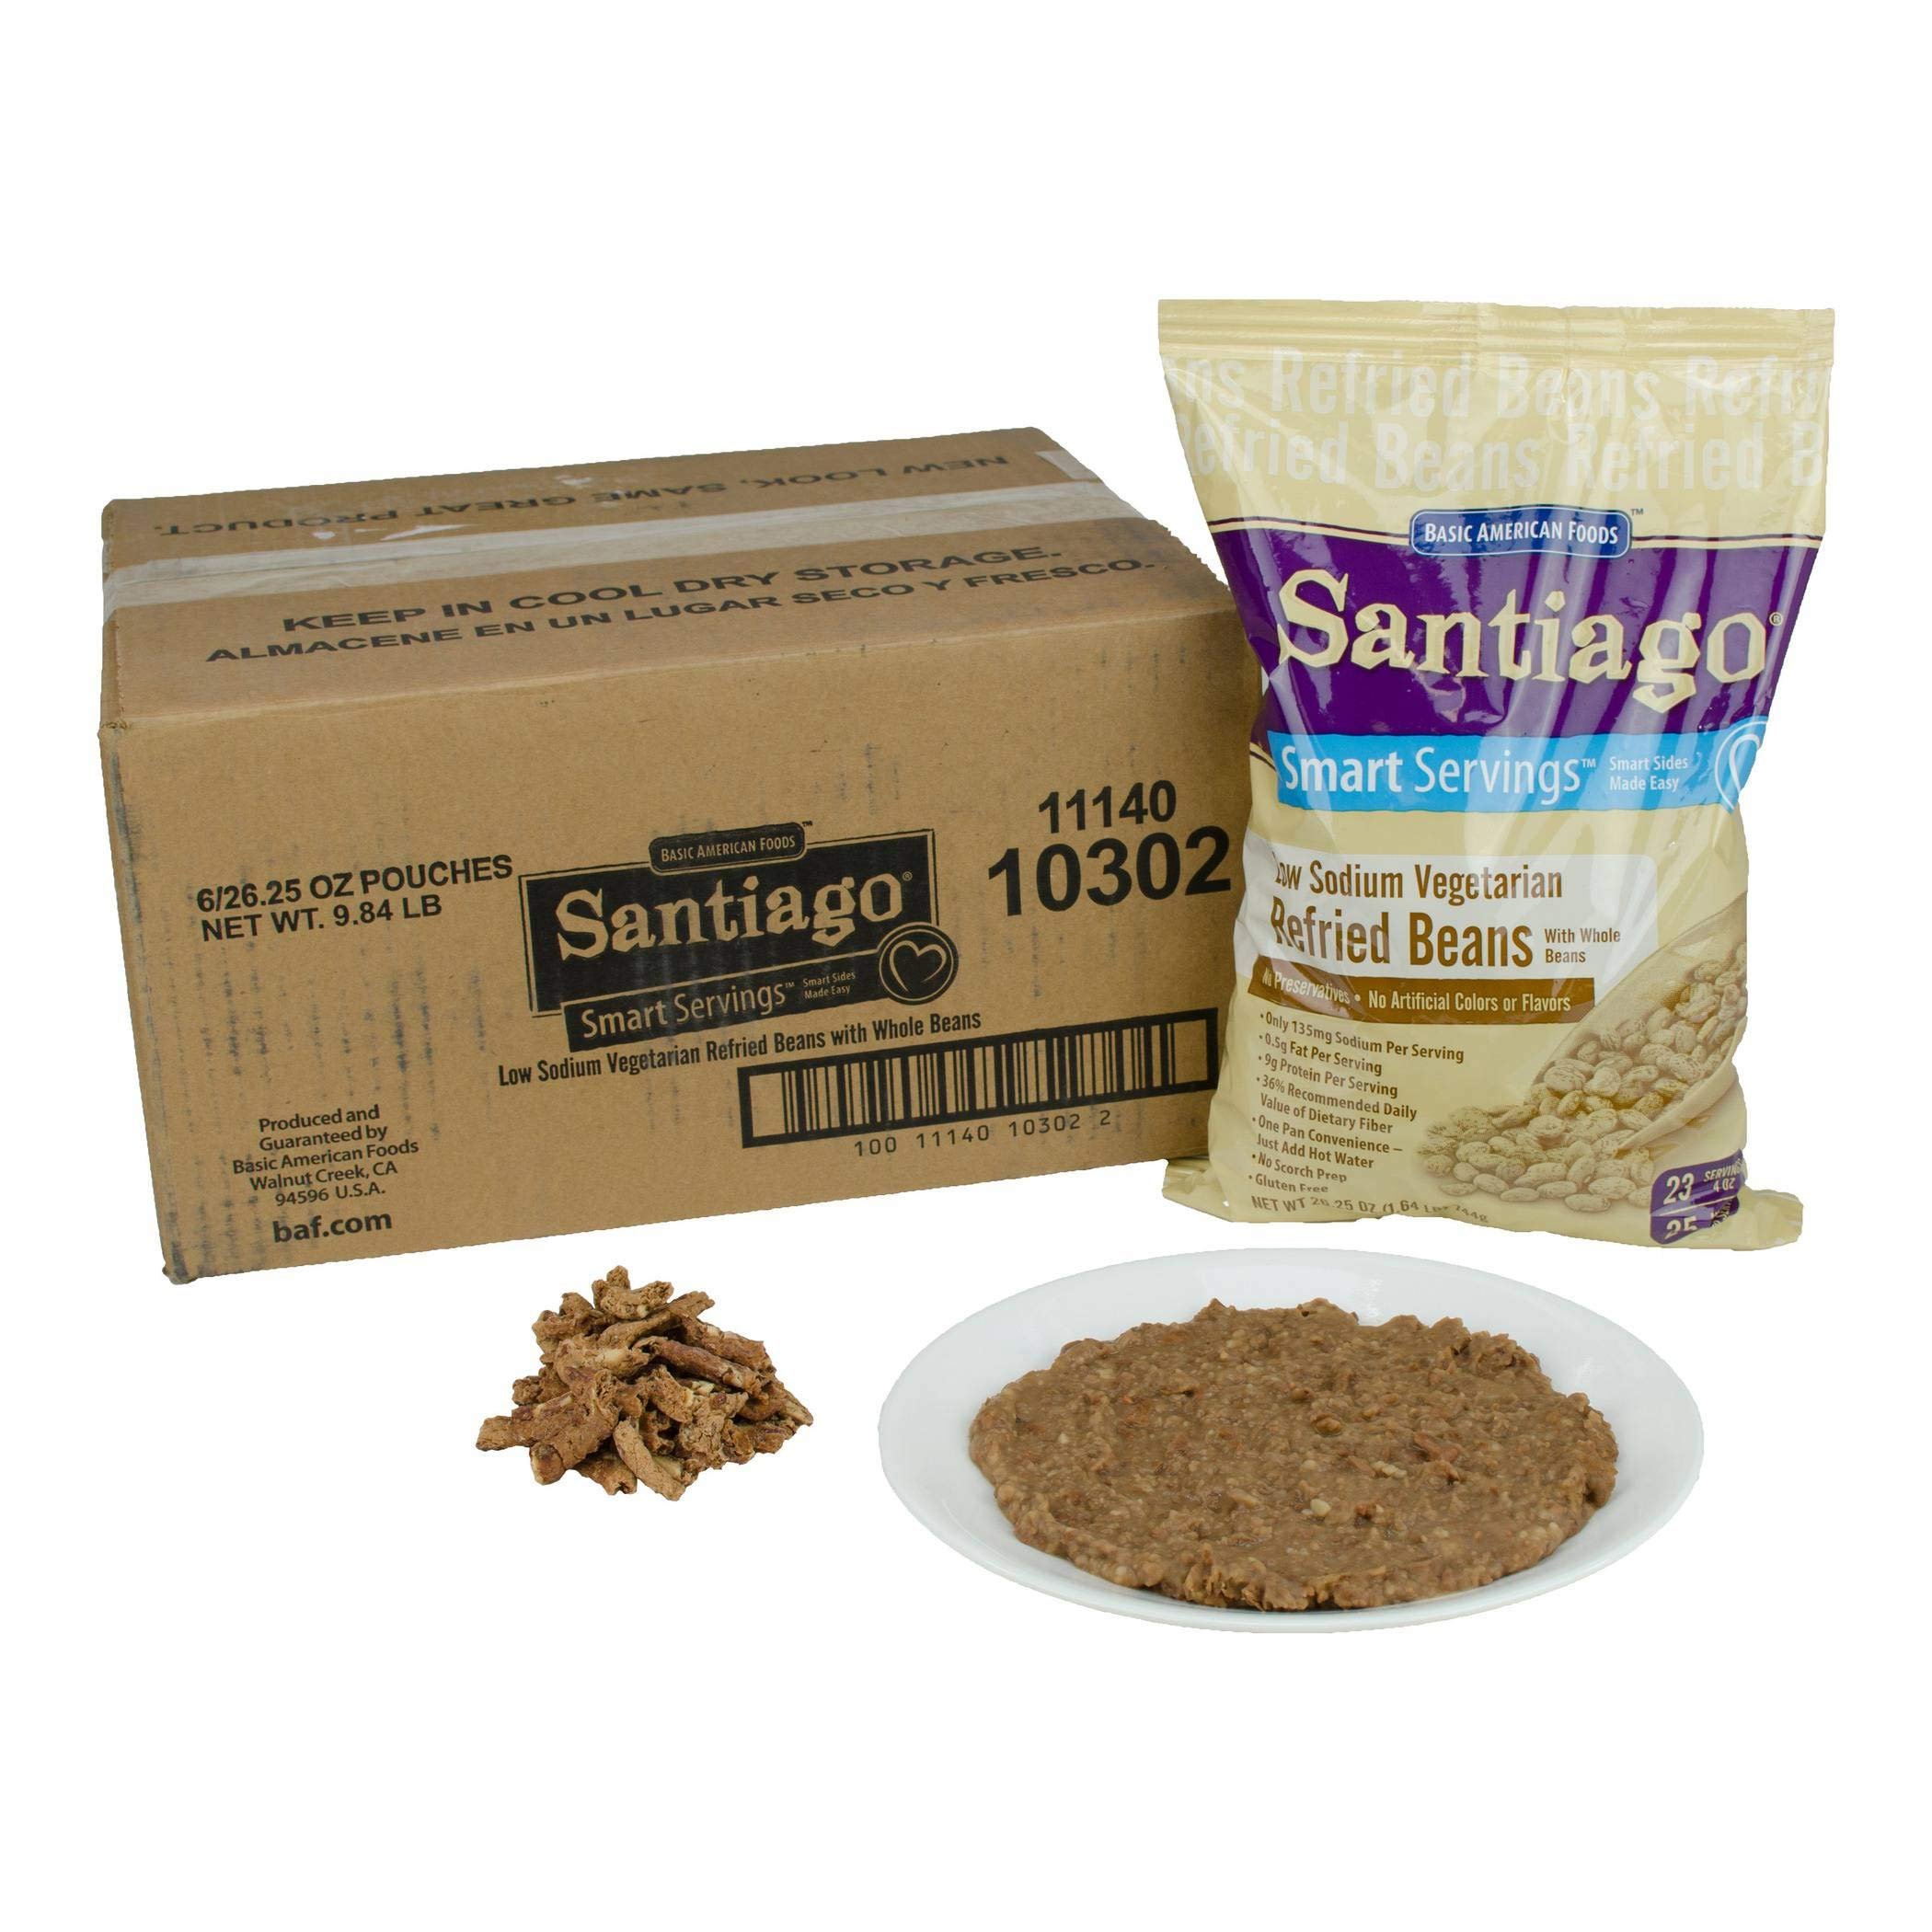 Santaigo Whole Vegetarian Refried Beans - 26.25 oz. pouch, 6 pouches per case by Basic American Foods